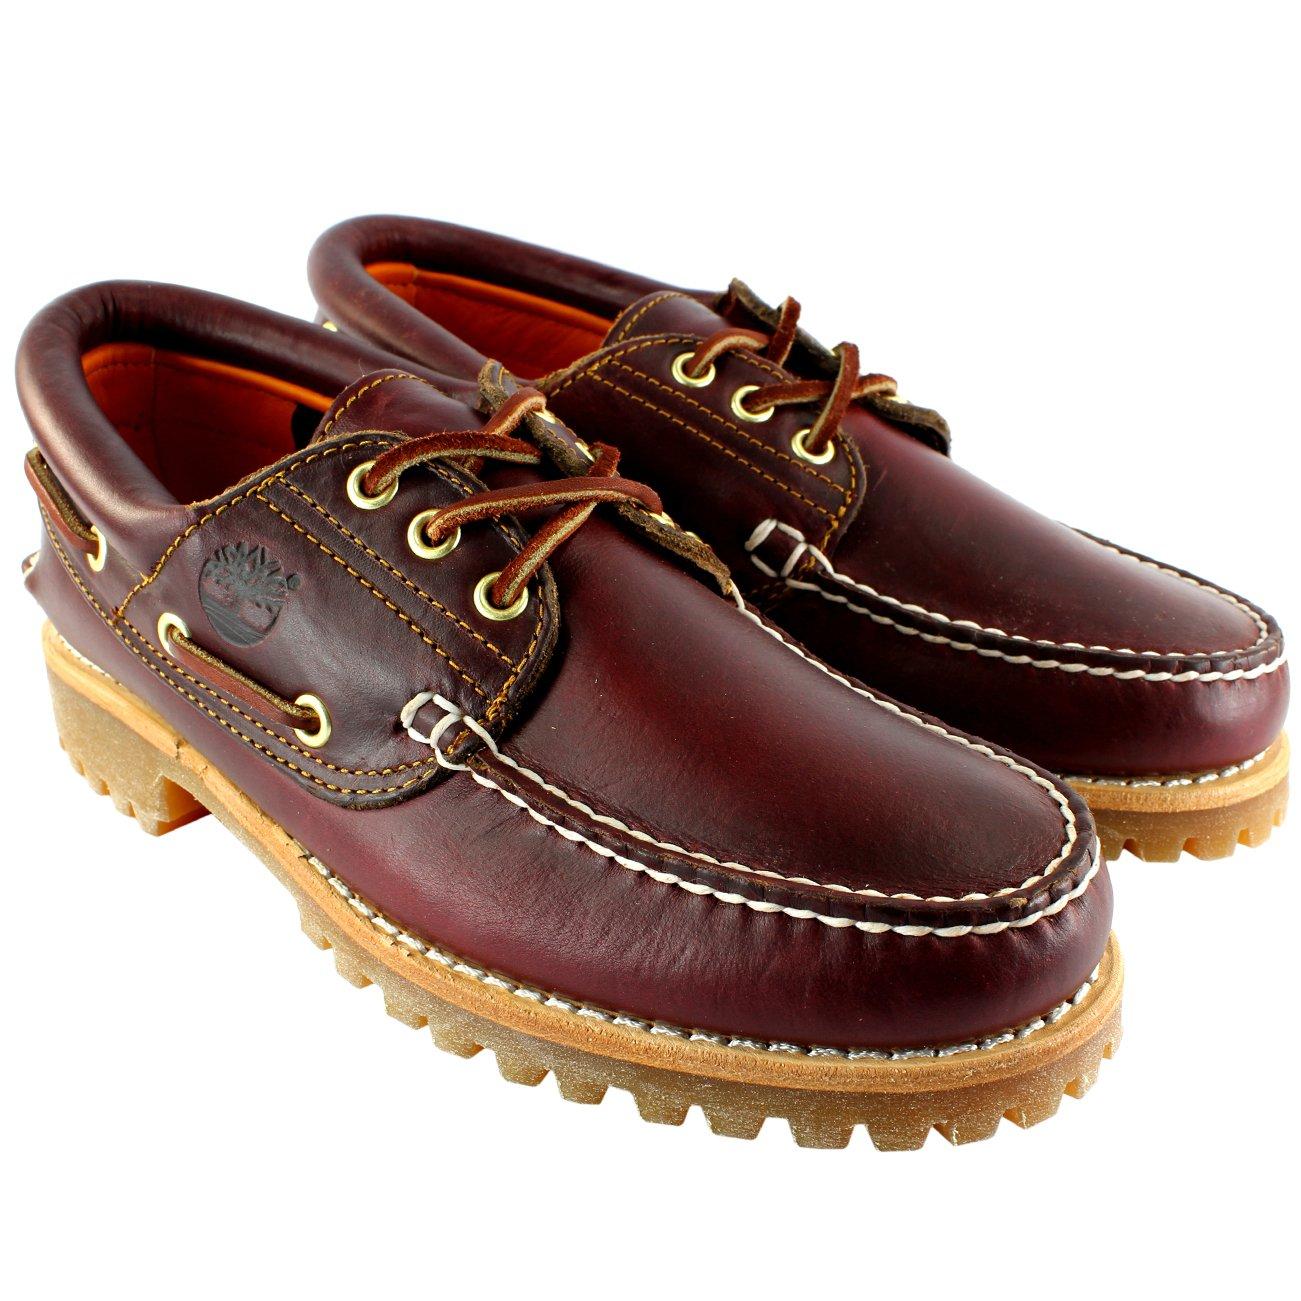 Mens Boat Shoes Amazon